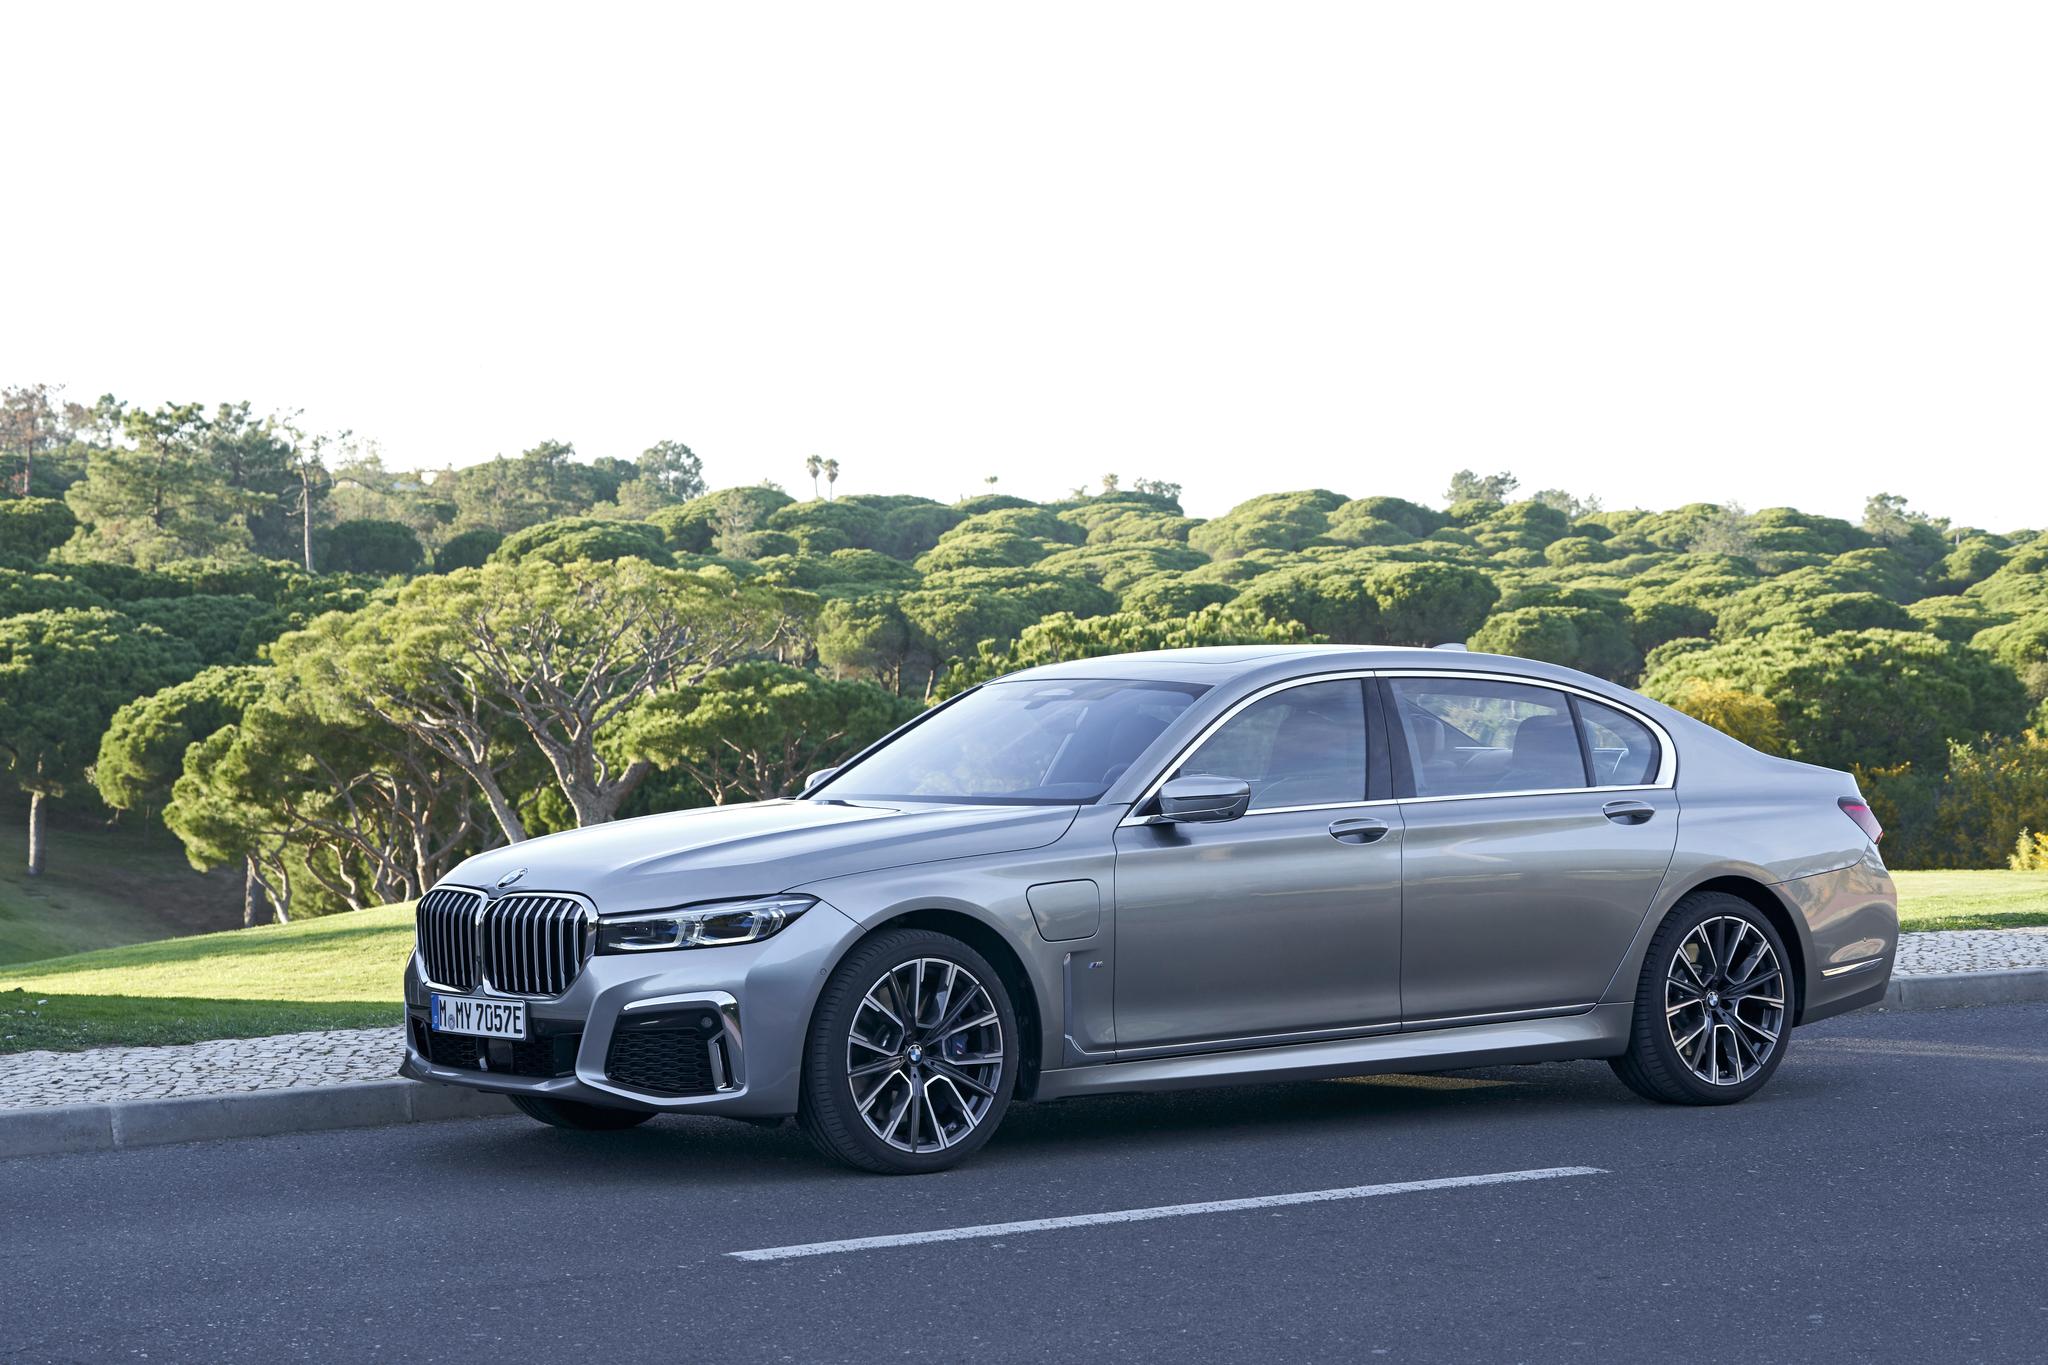 BMW 더 뉴 7시리즈의 측면 공기 흡입구는 수직형태로 바뀌었다. [BMW그룹]